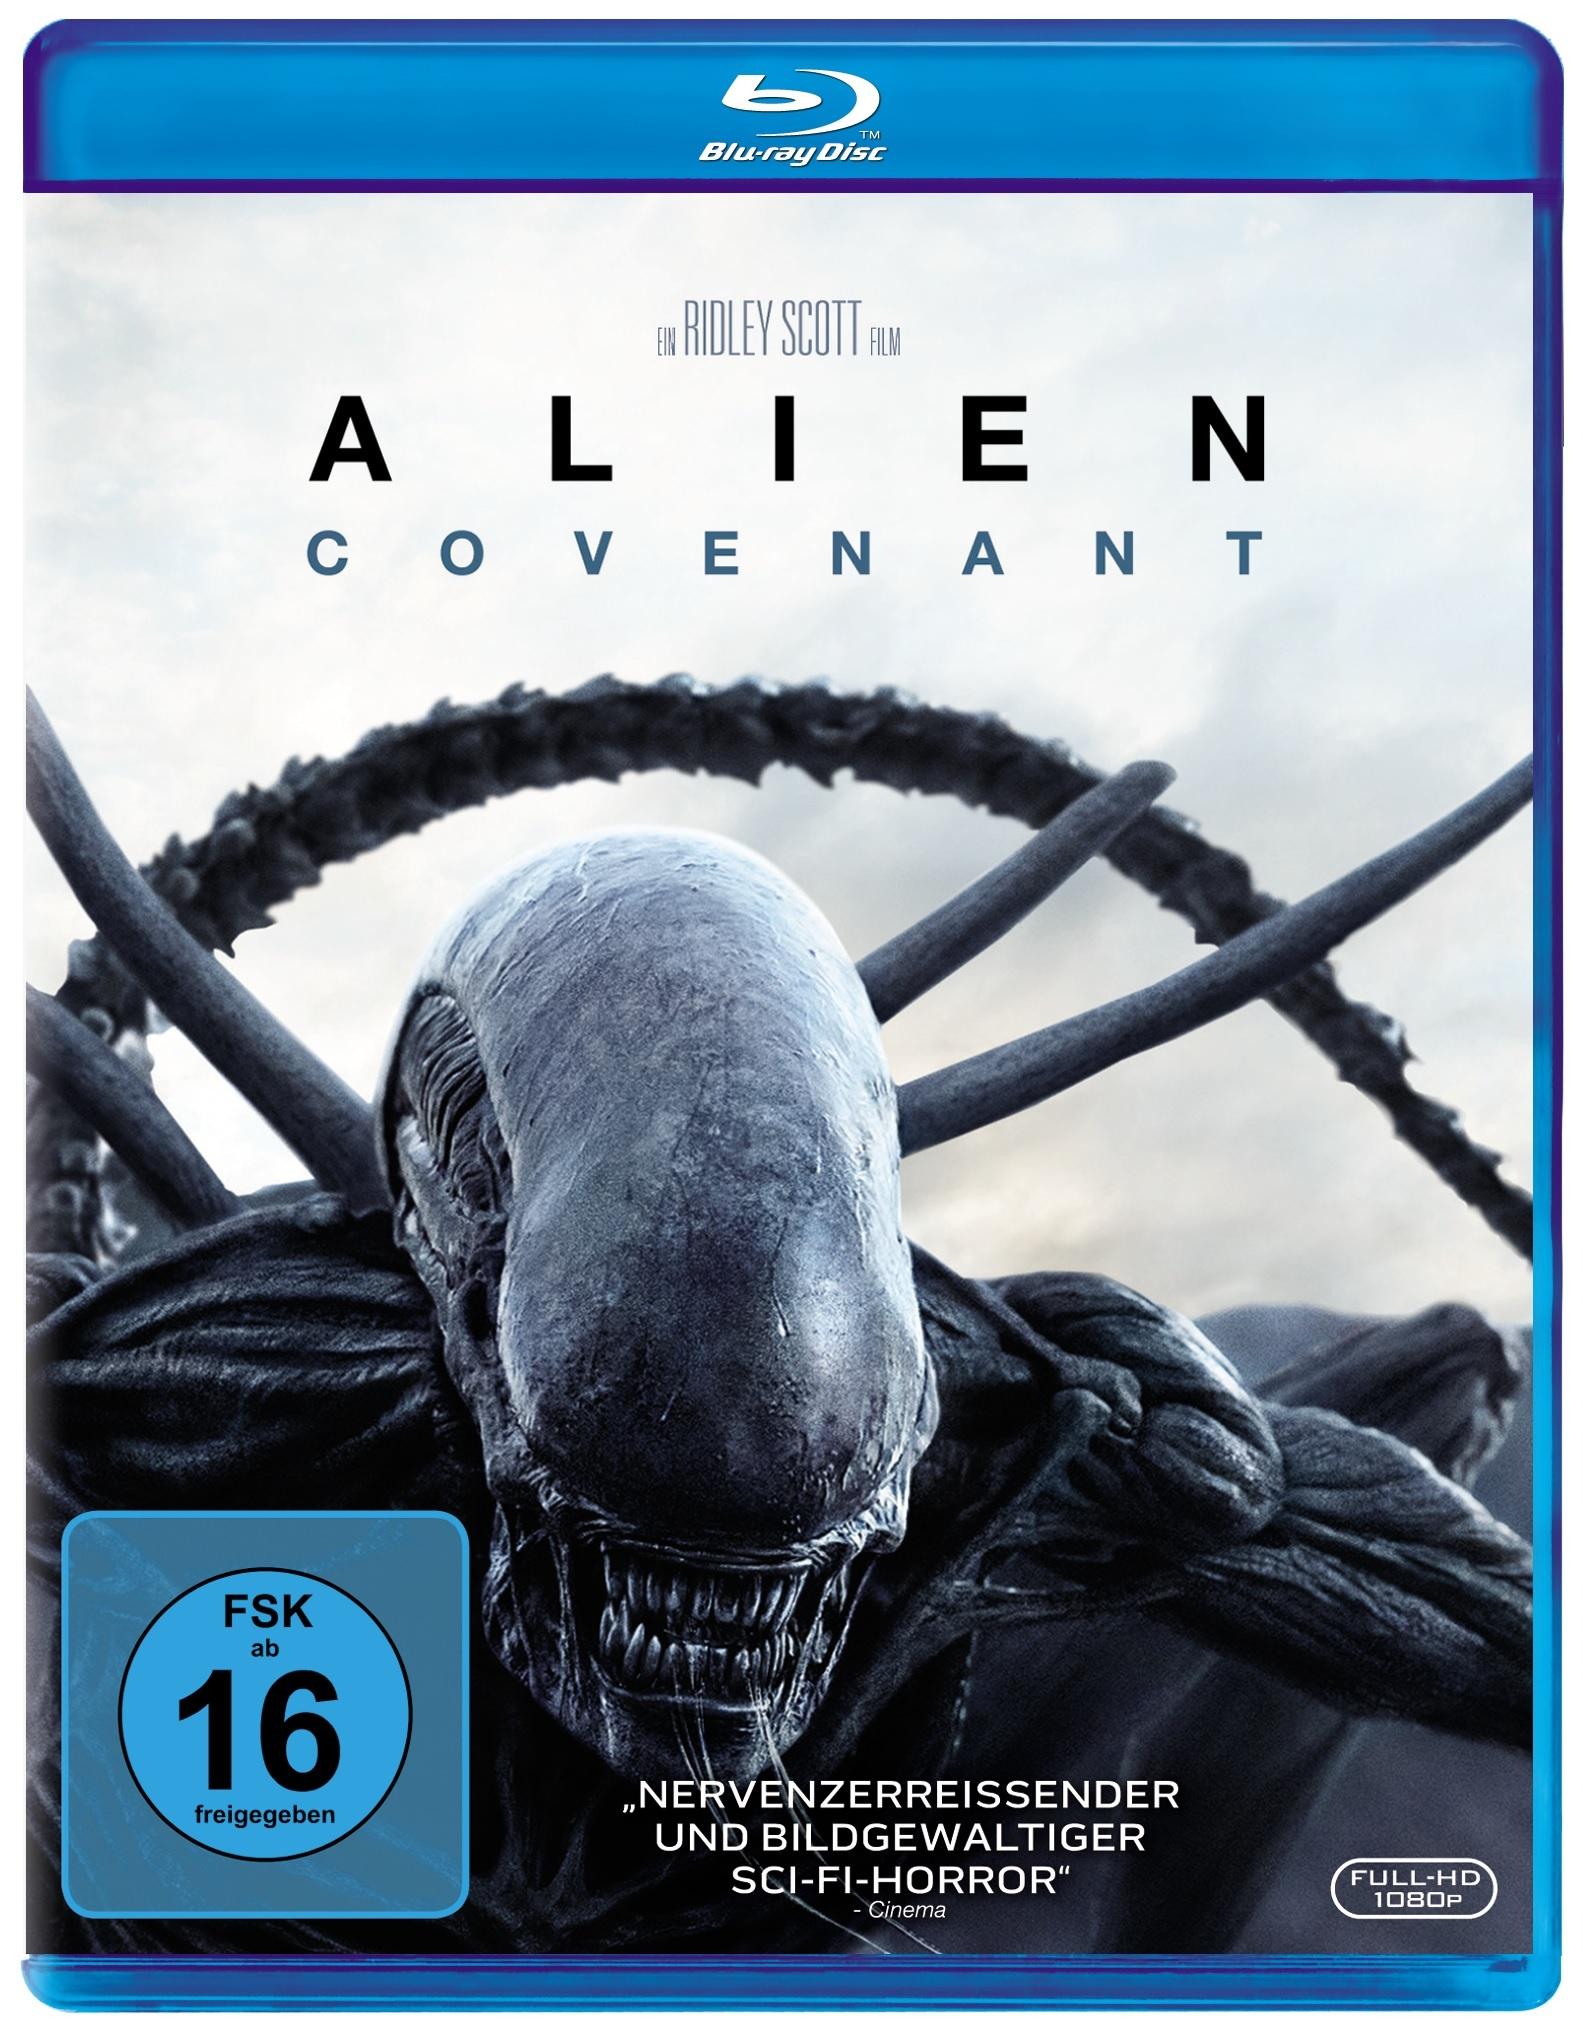 Image of Alien: Covenant